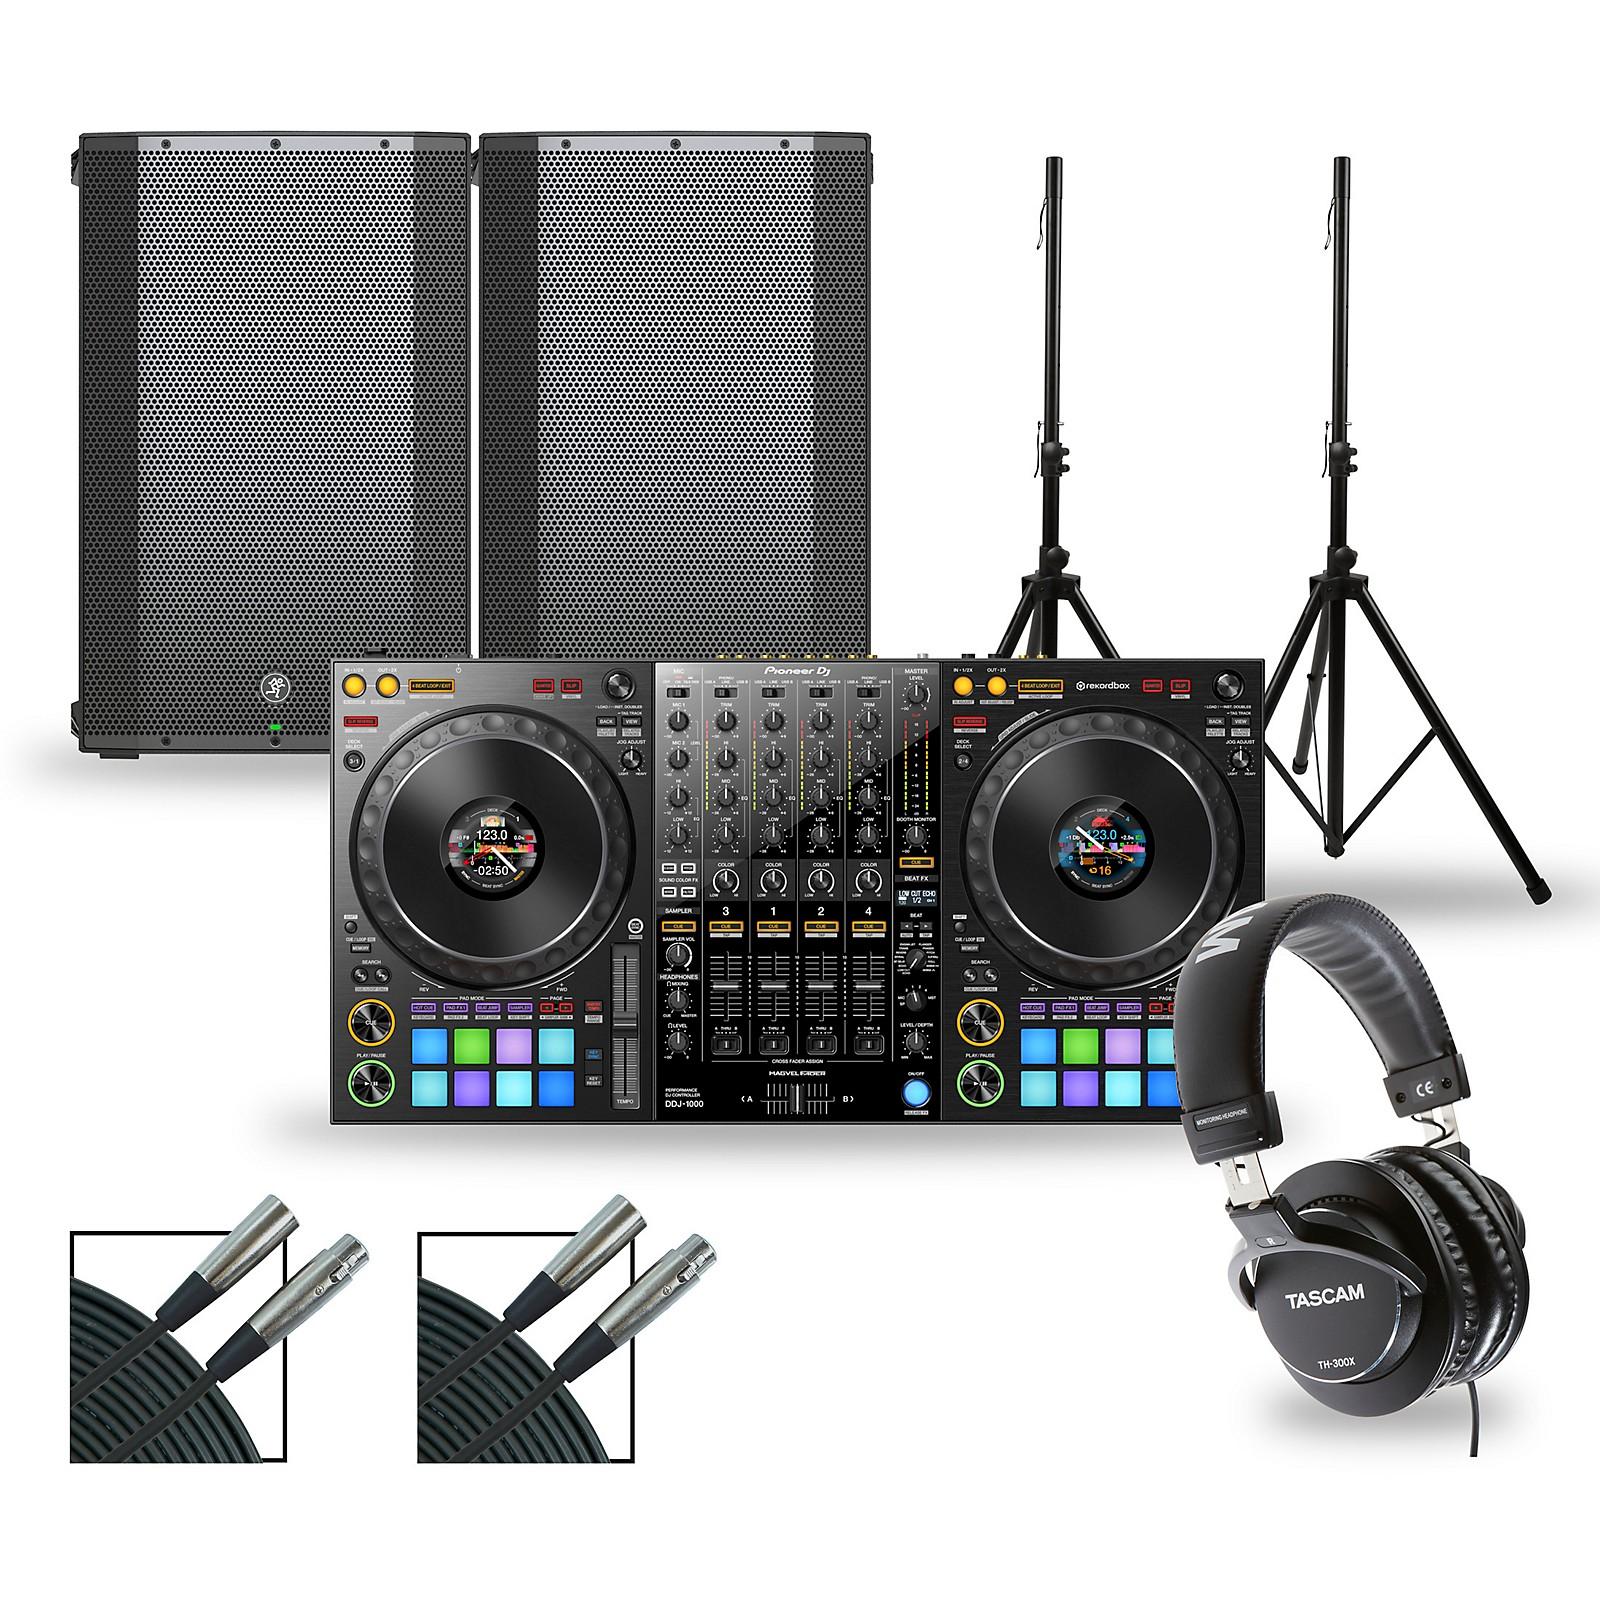 Pioneer DJ Package with DDJ-1000 Controller and Mackie Thump Series Speakers